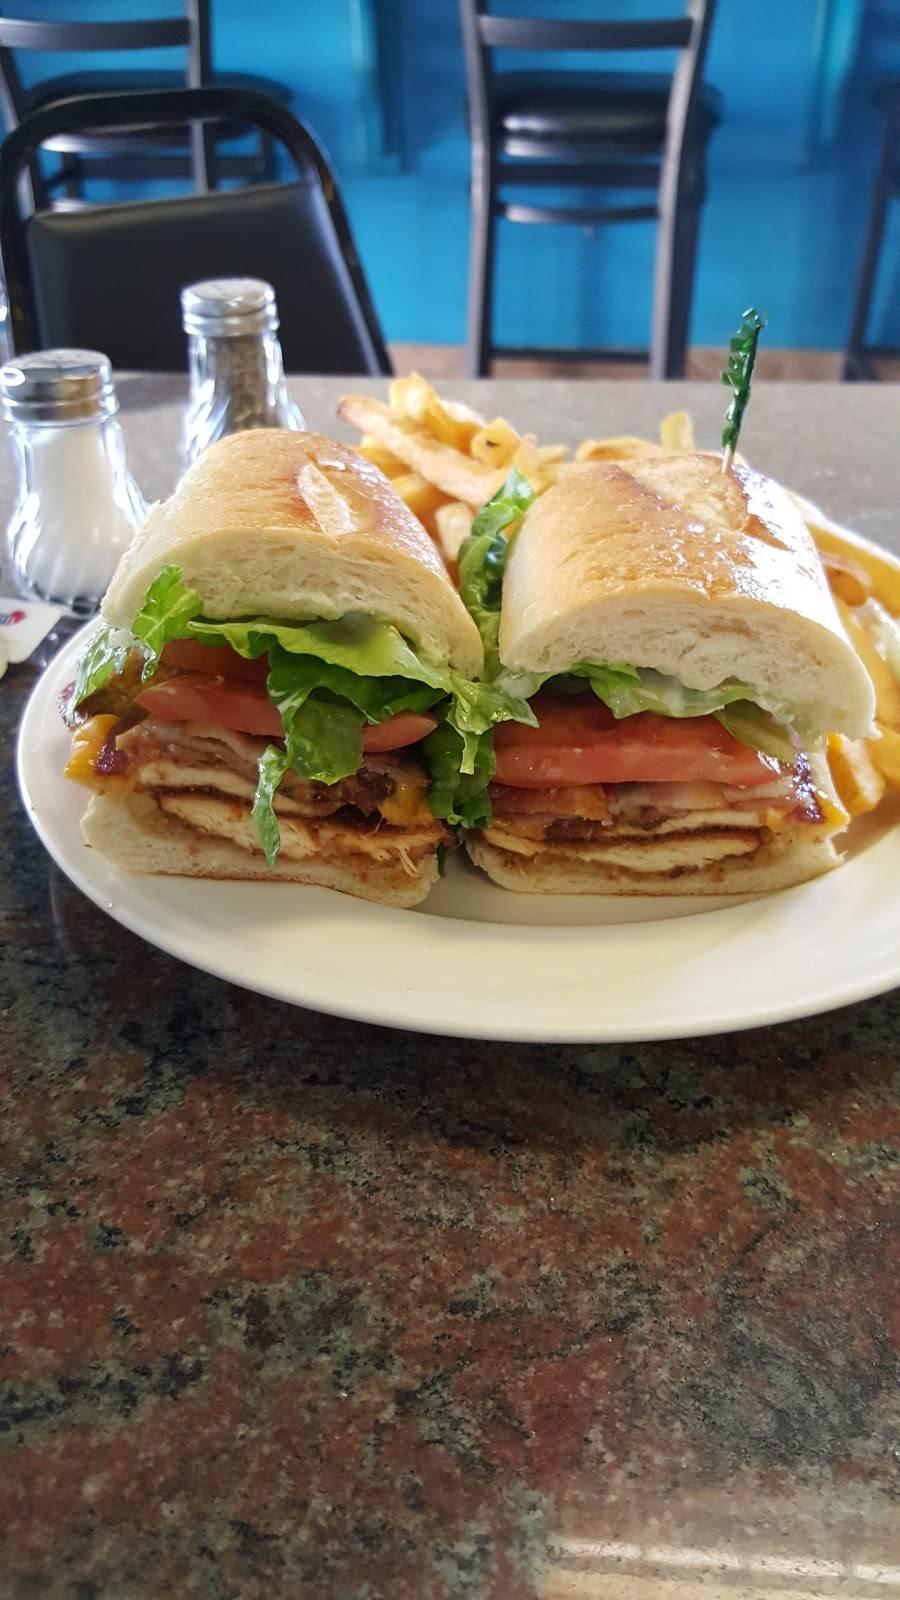 Oasis Coffee Shop   restaurant   390 Tiffany St, Bronx, NY 10474, USA   7183284400 OR +1 718-328-4400